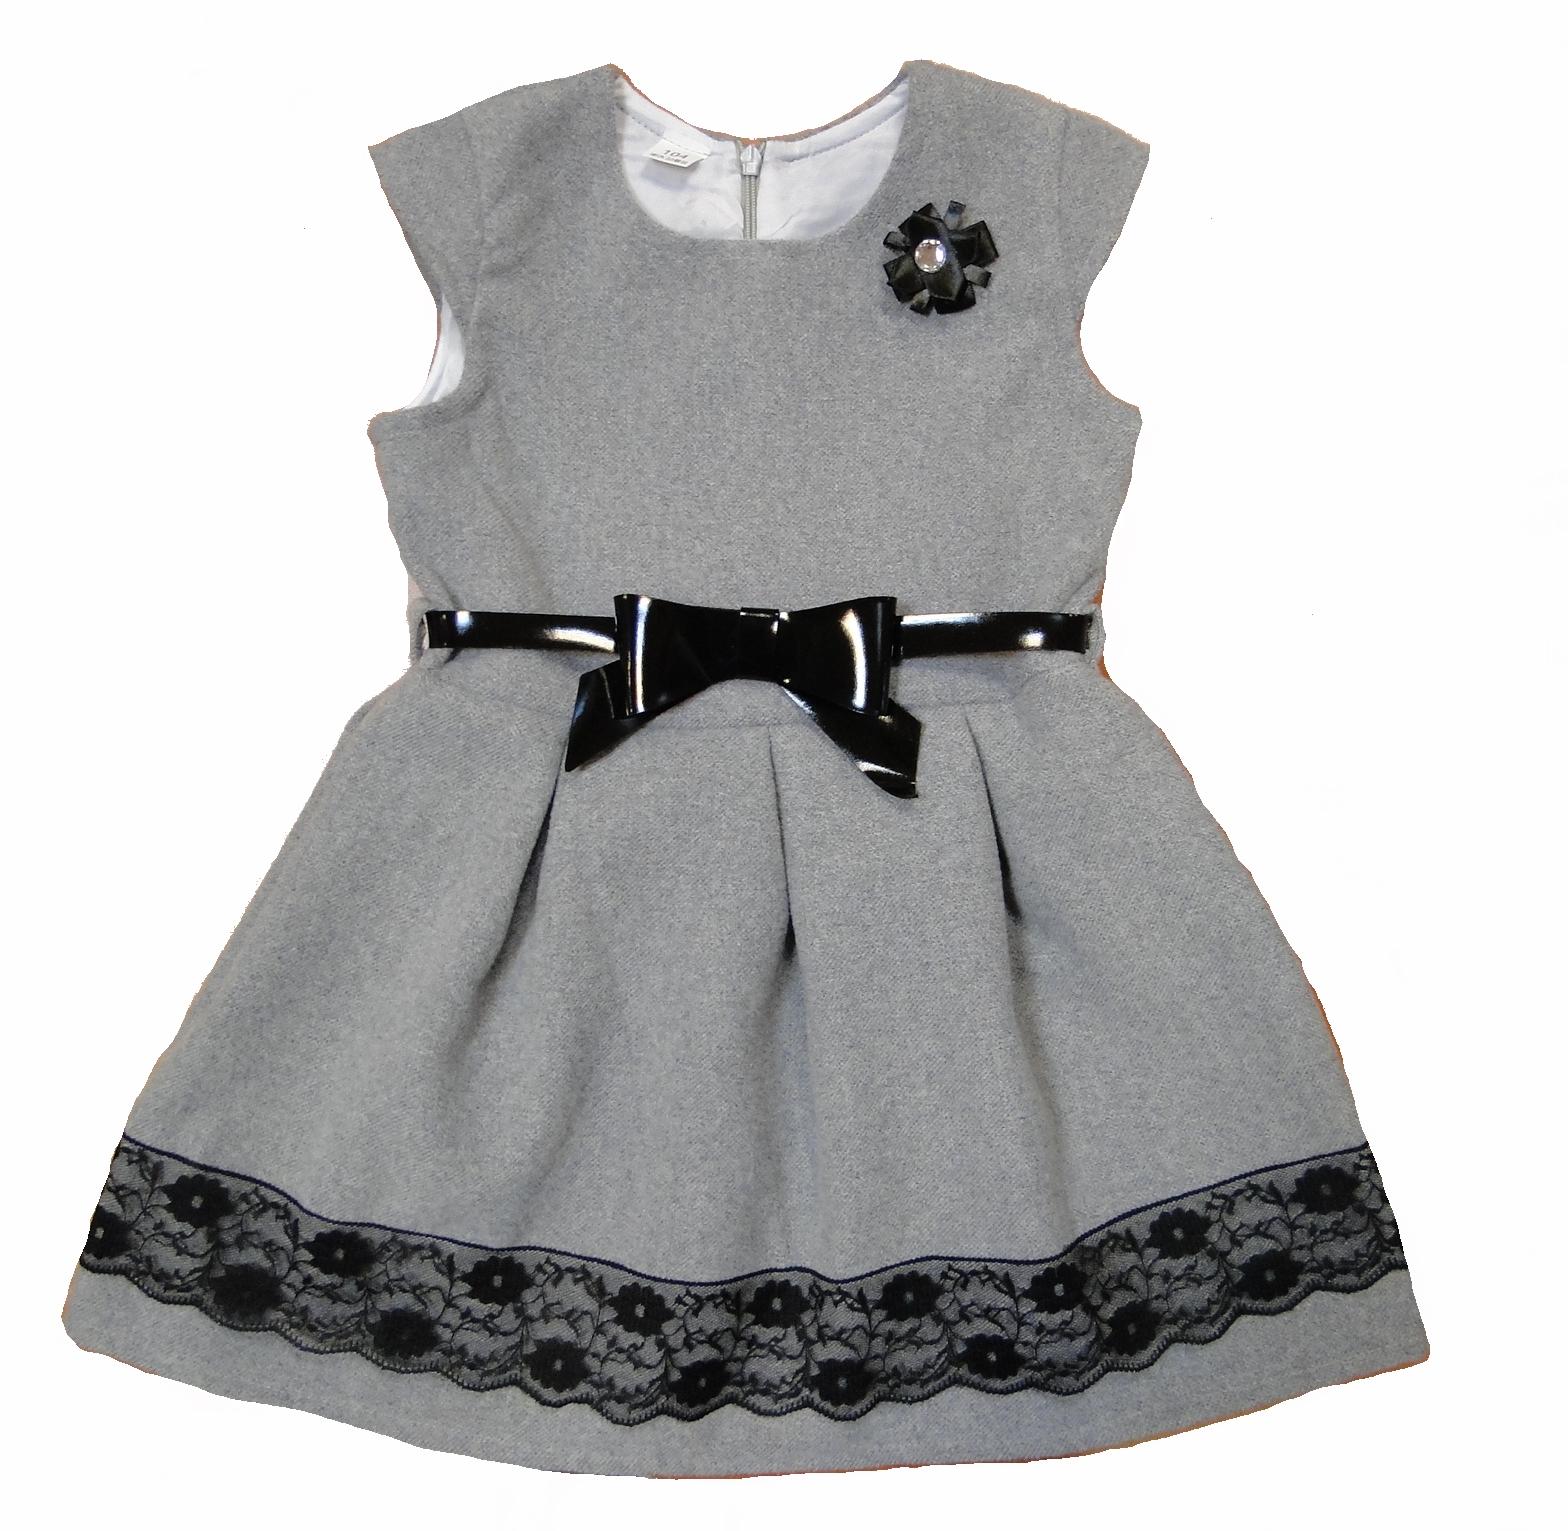 dcc1079d78 Gaffa K2147 elegancka sukienka 134 cm - 7063538229 - oficjalne ...